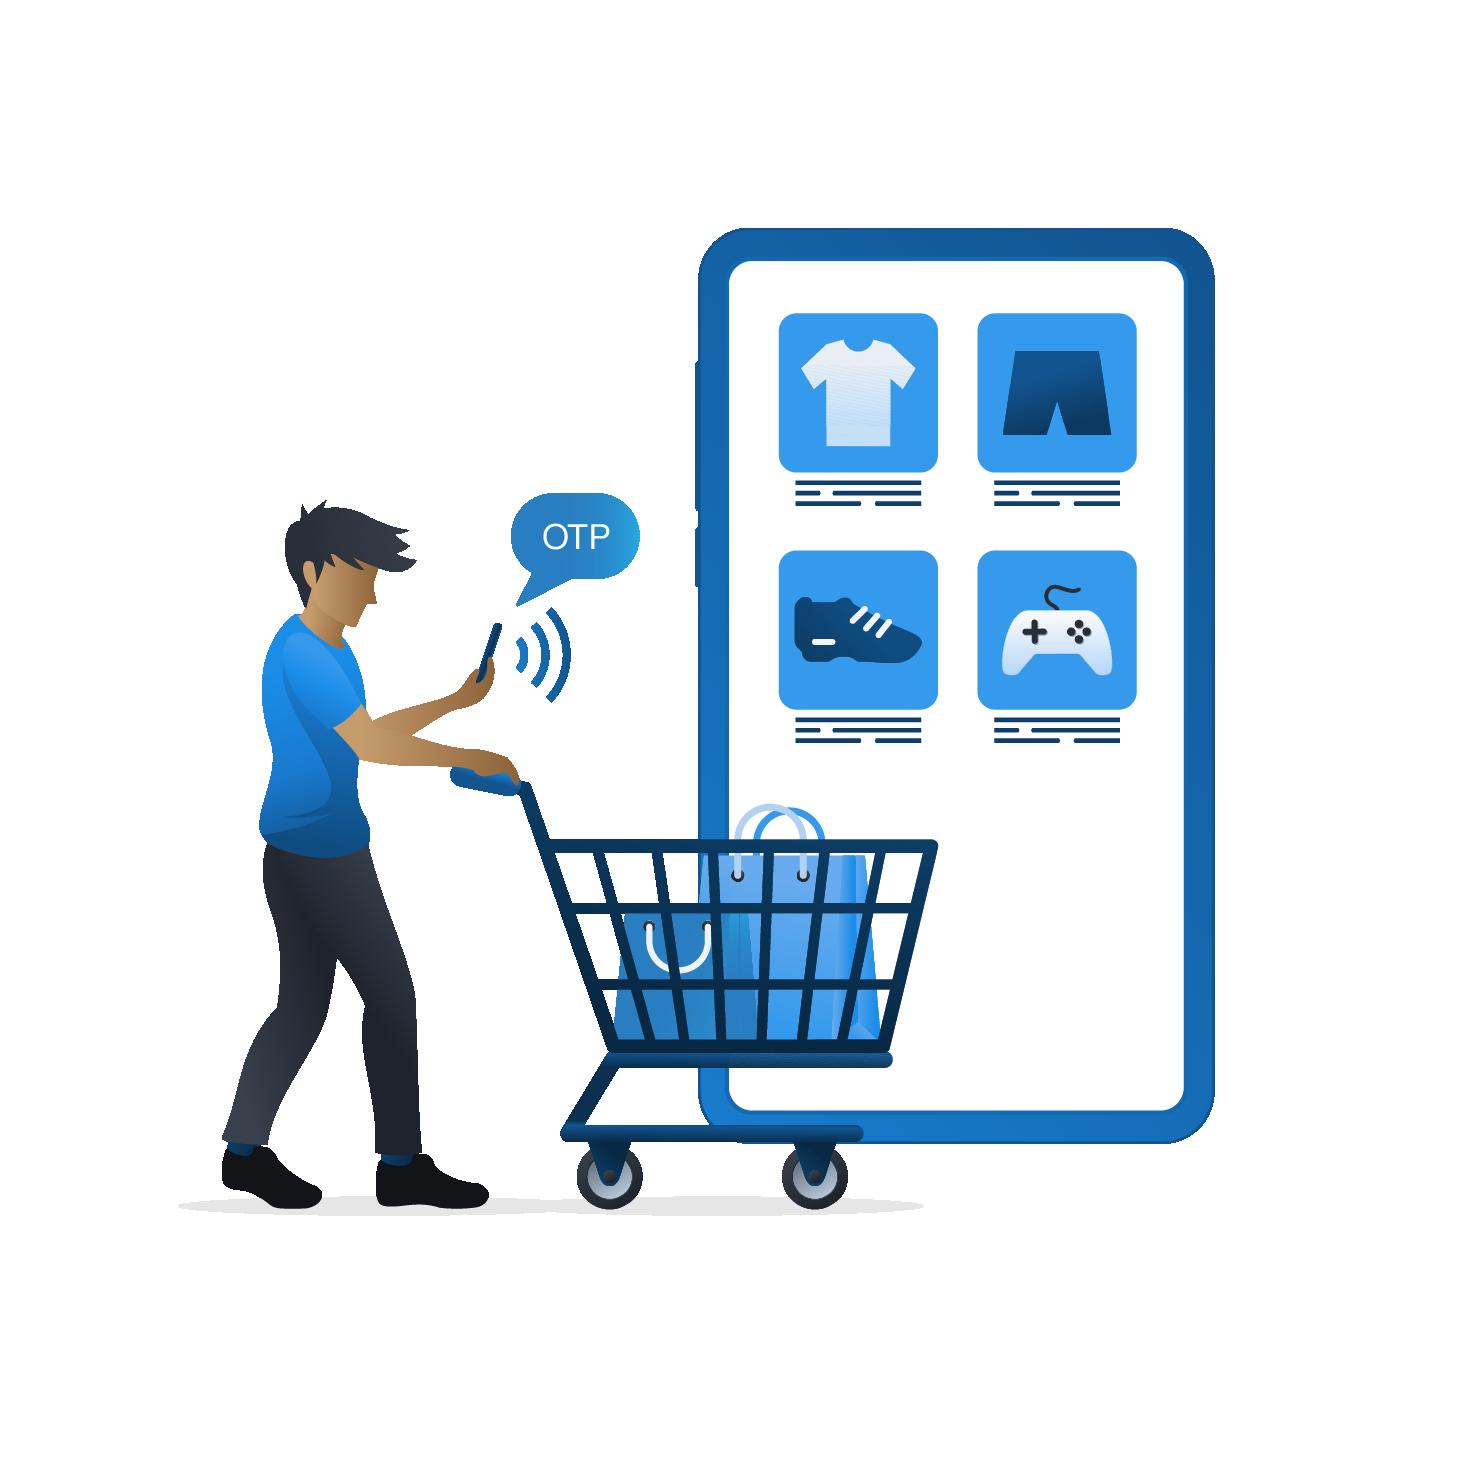 online shopping phone image